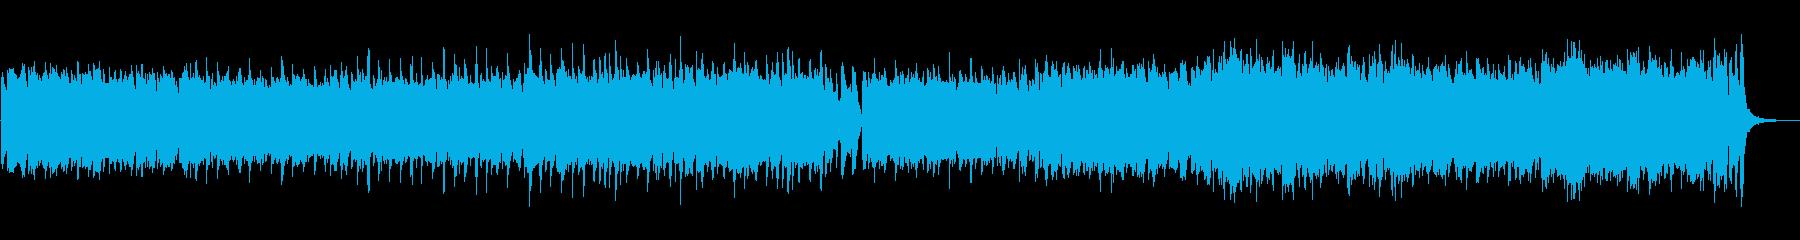 KANTシンプル優雅なピアノ&オケの再生済みの波形